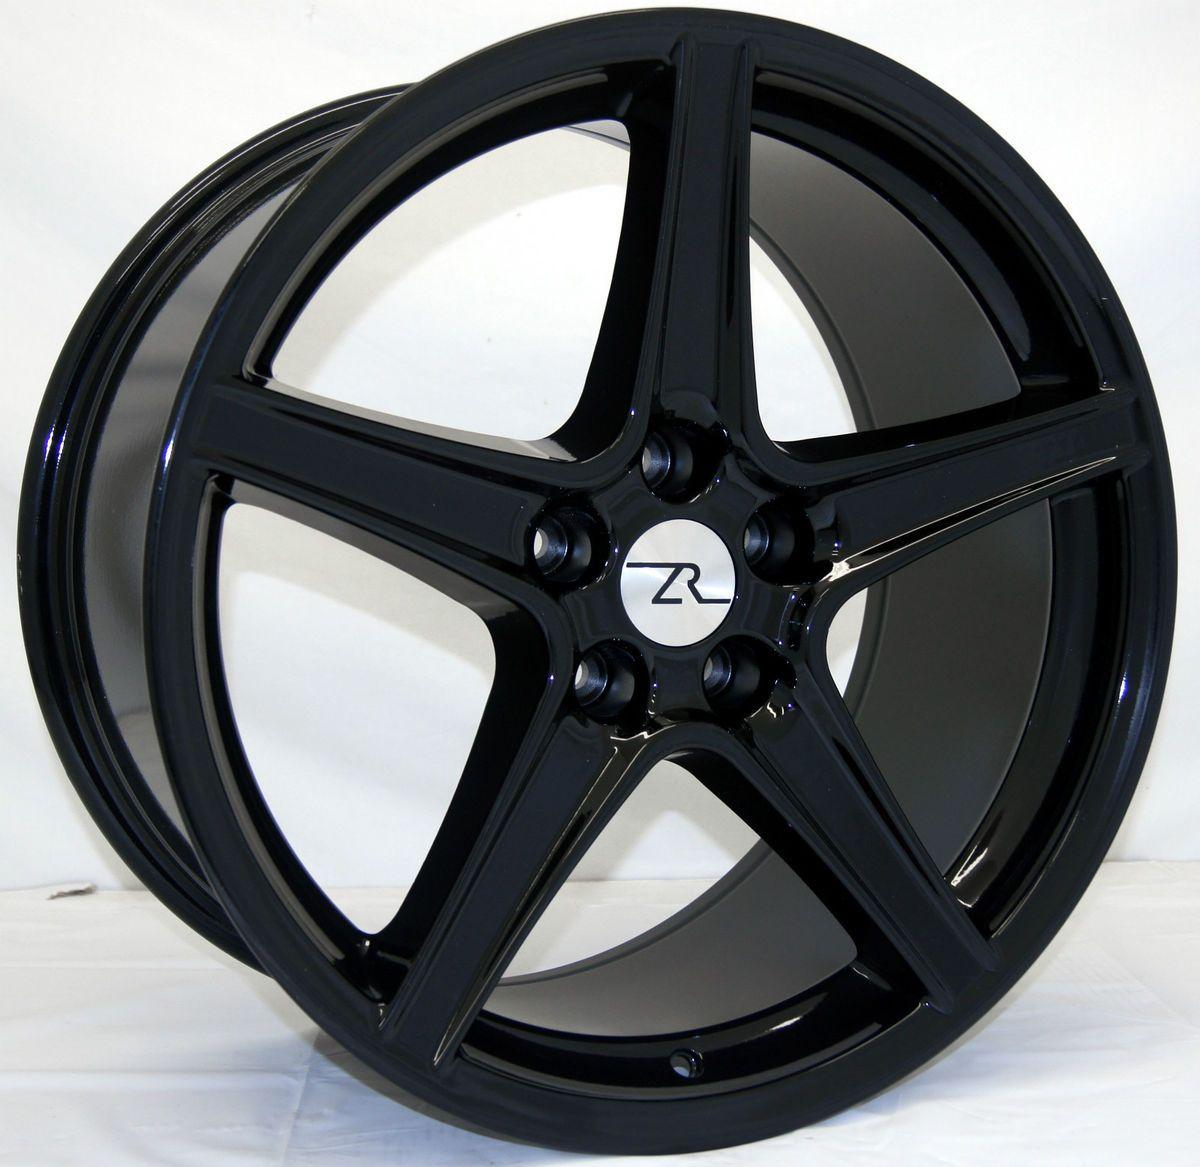 Black Mustang ® Wheels fits Saleen 19 Replica 1994 2013 19 inch rims